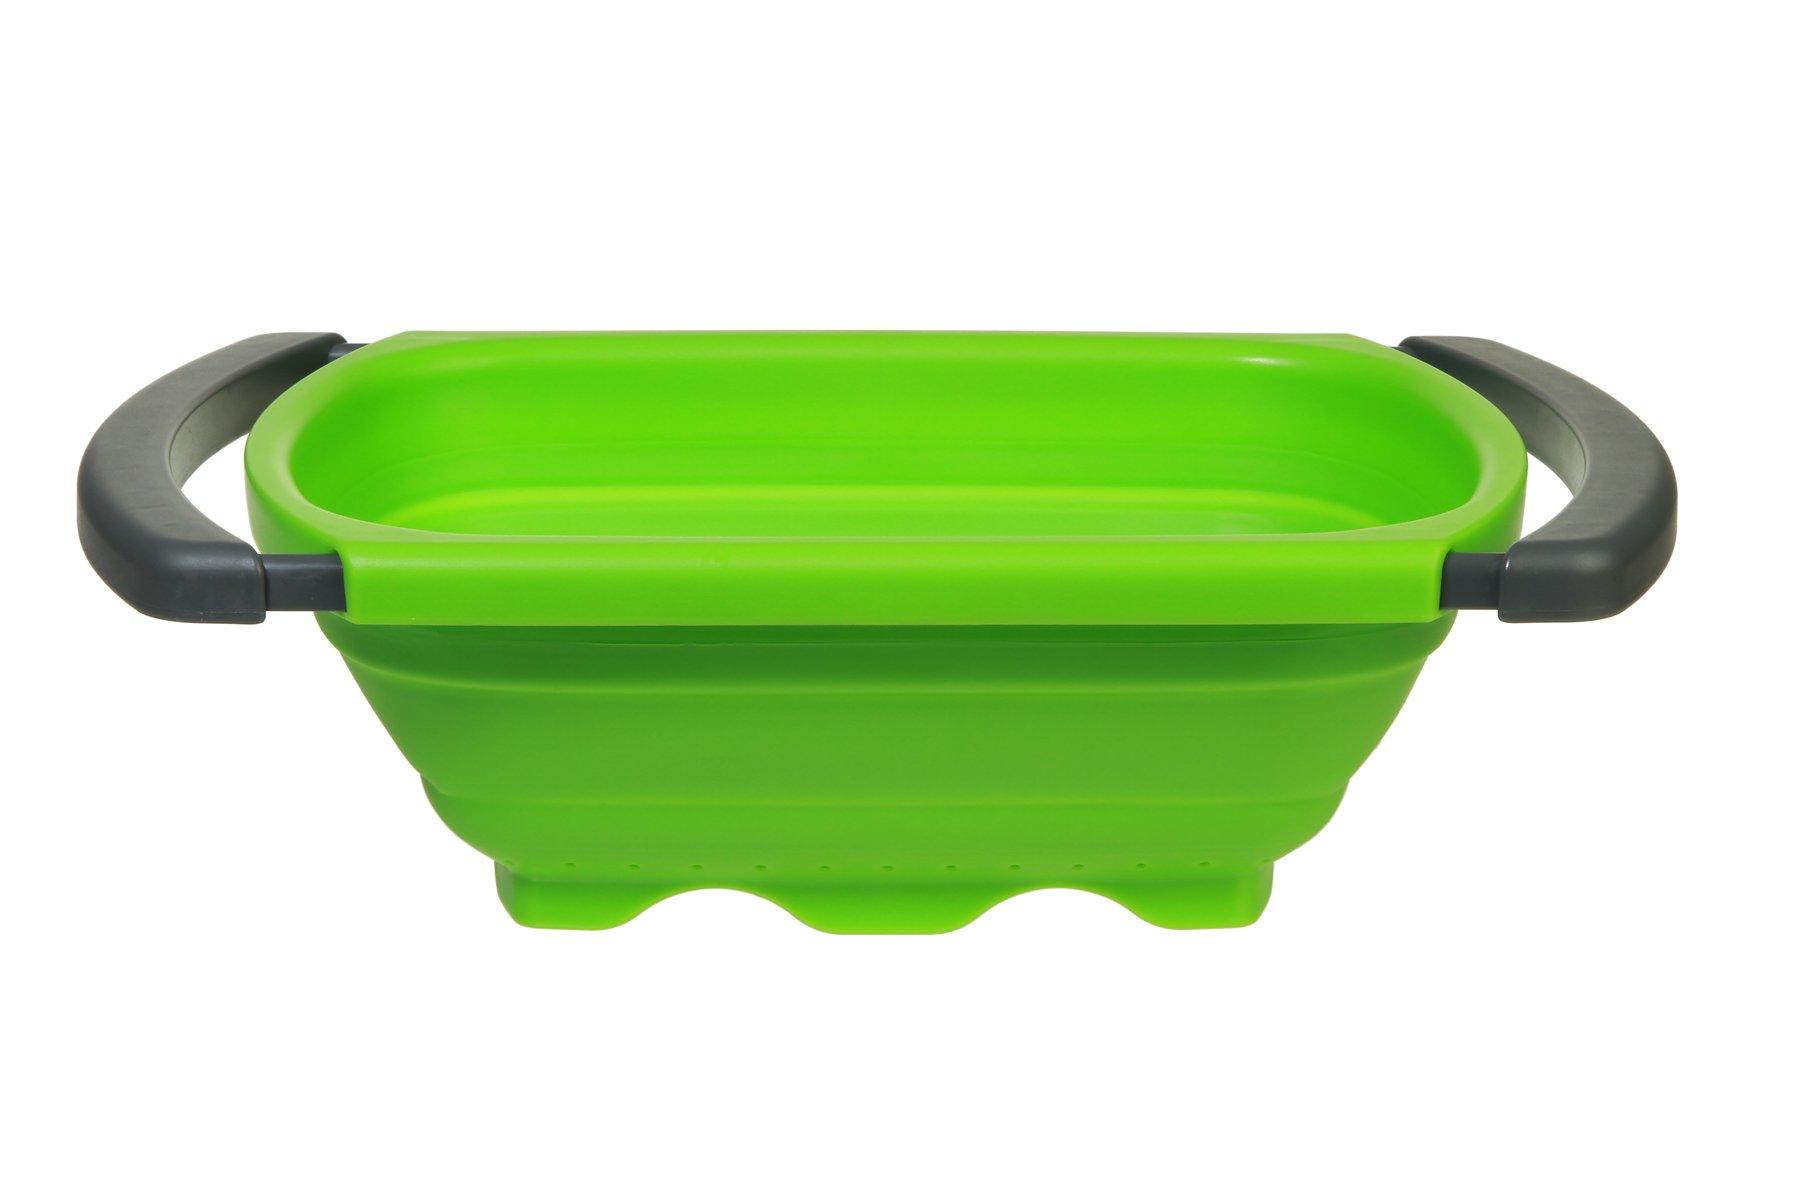 Prepworks by Progressive Collapsible Over-the -Sink Colander, Green - 6 Quart (CC-130)